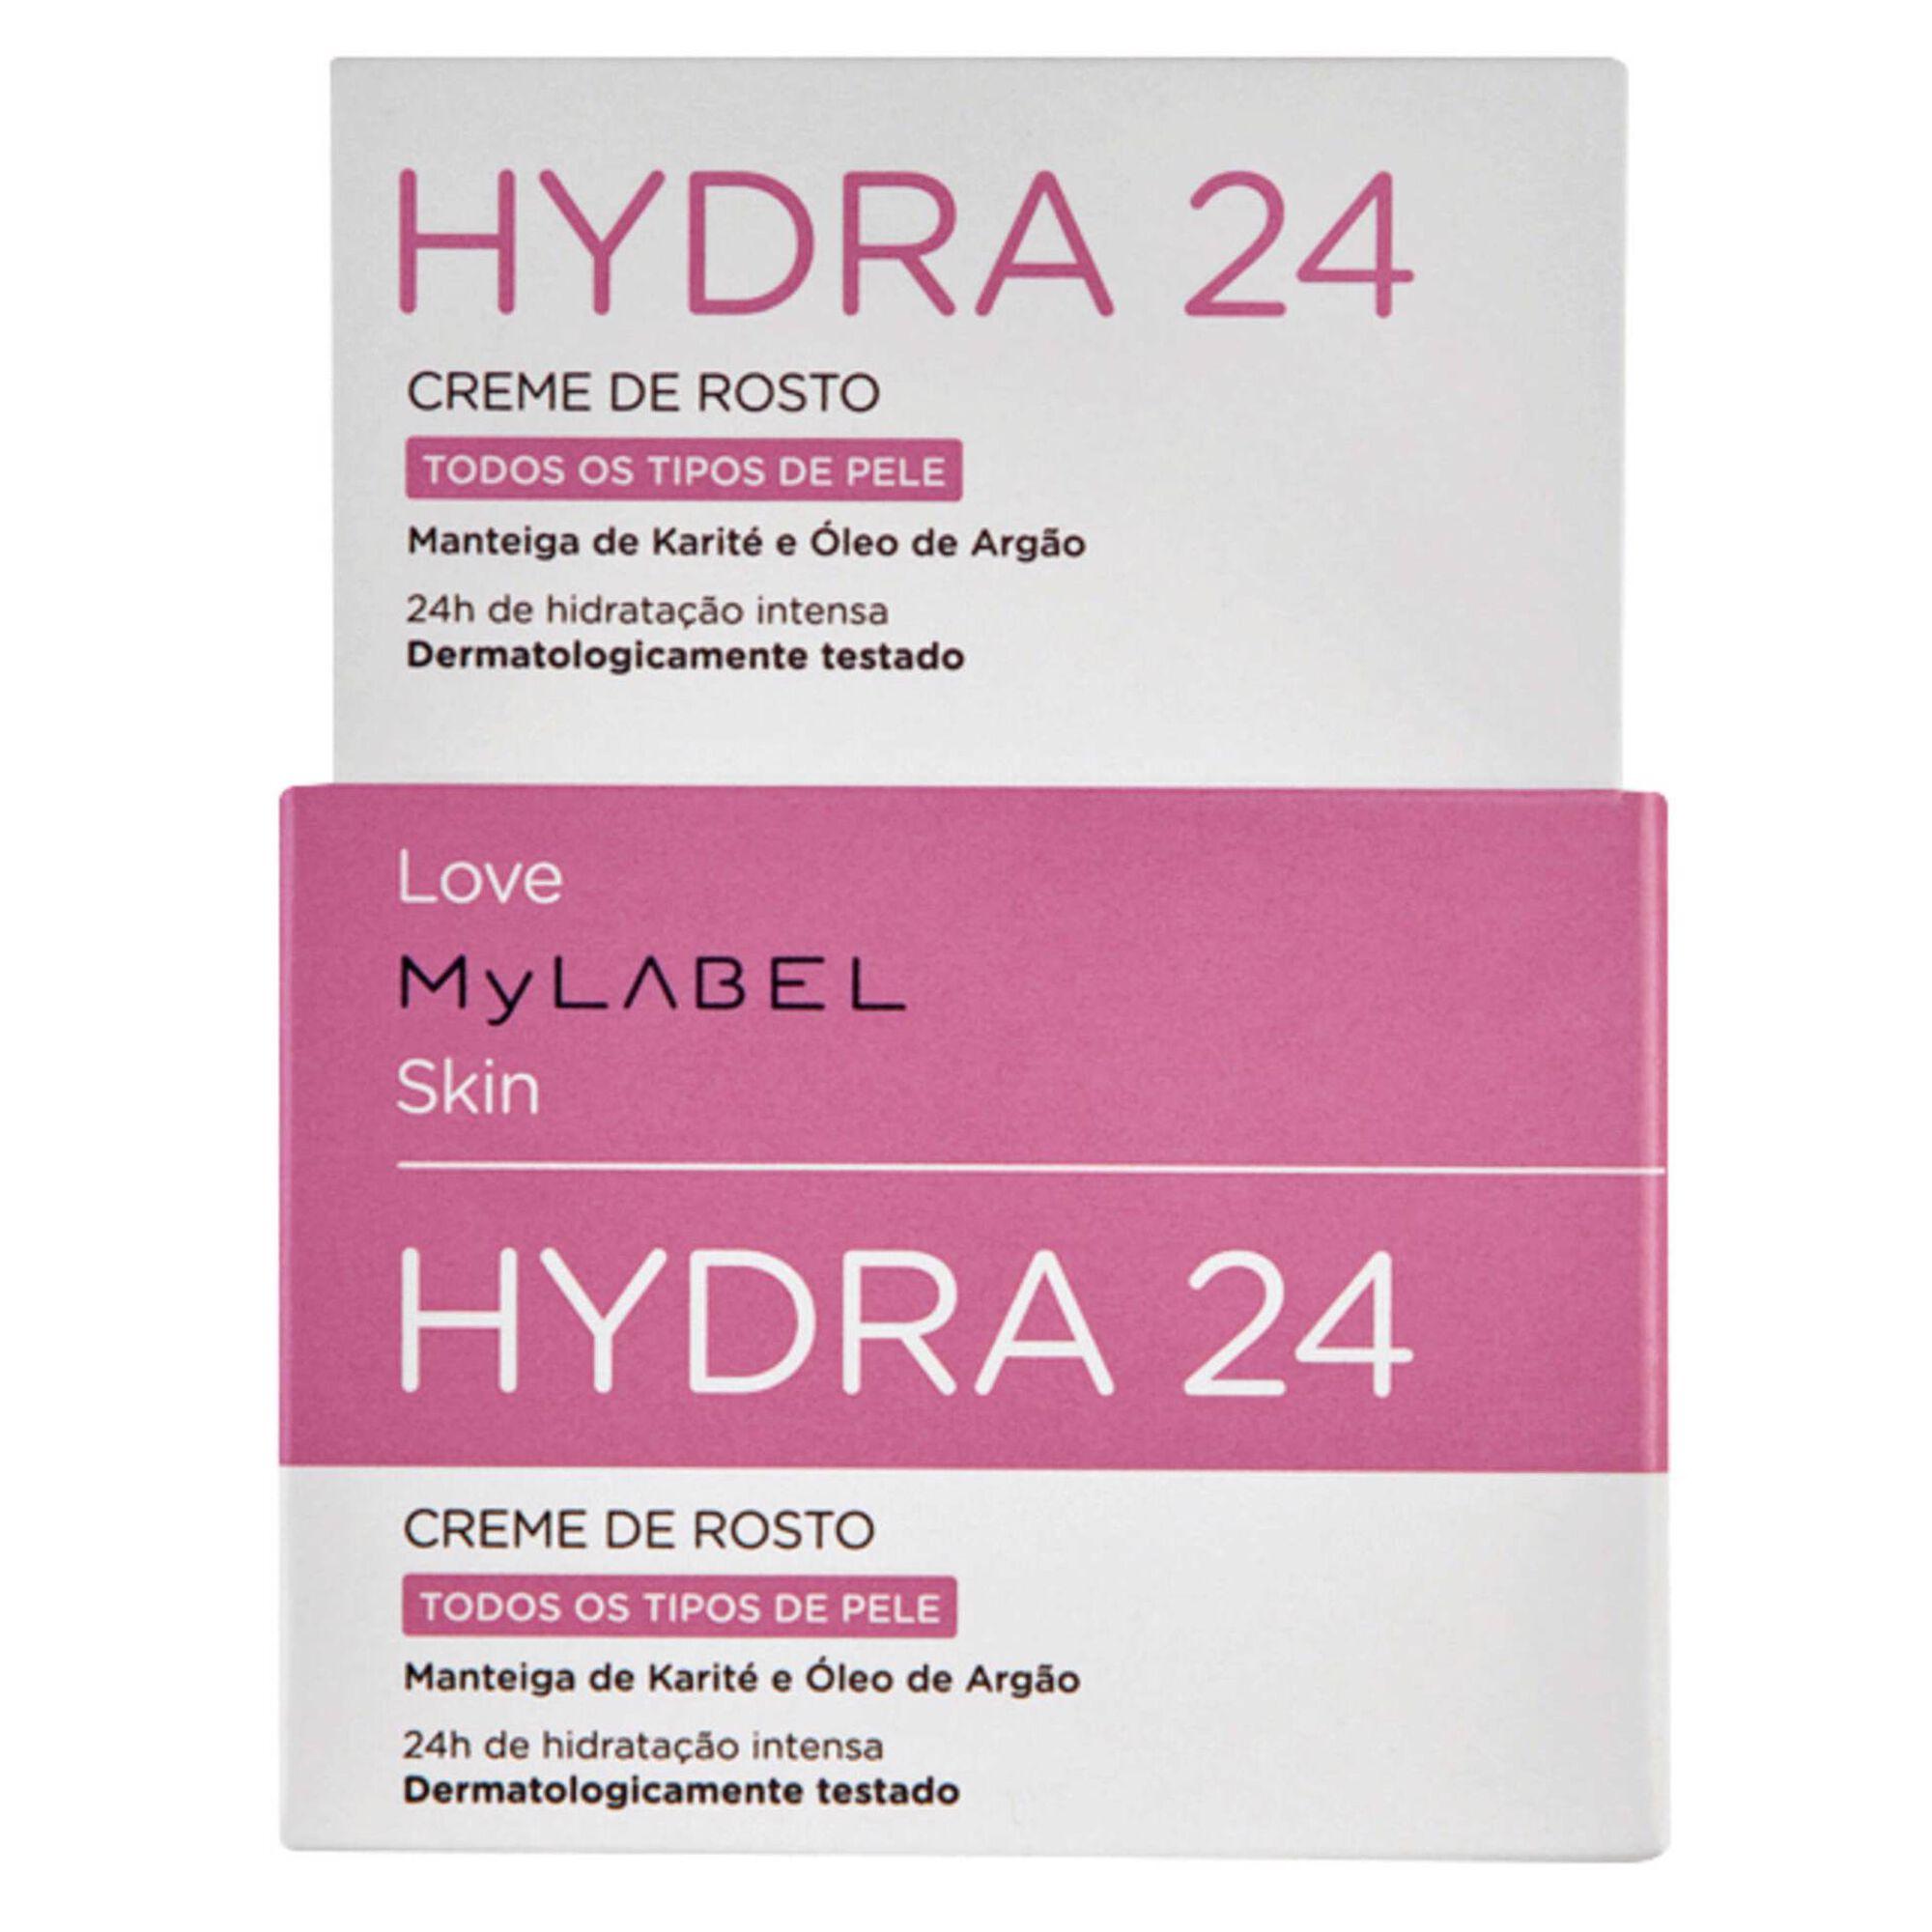 Creme Rosto Hydra 24